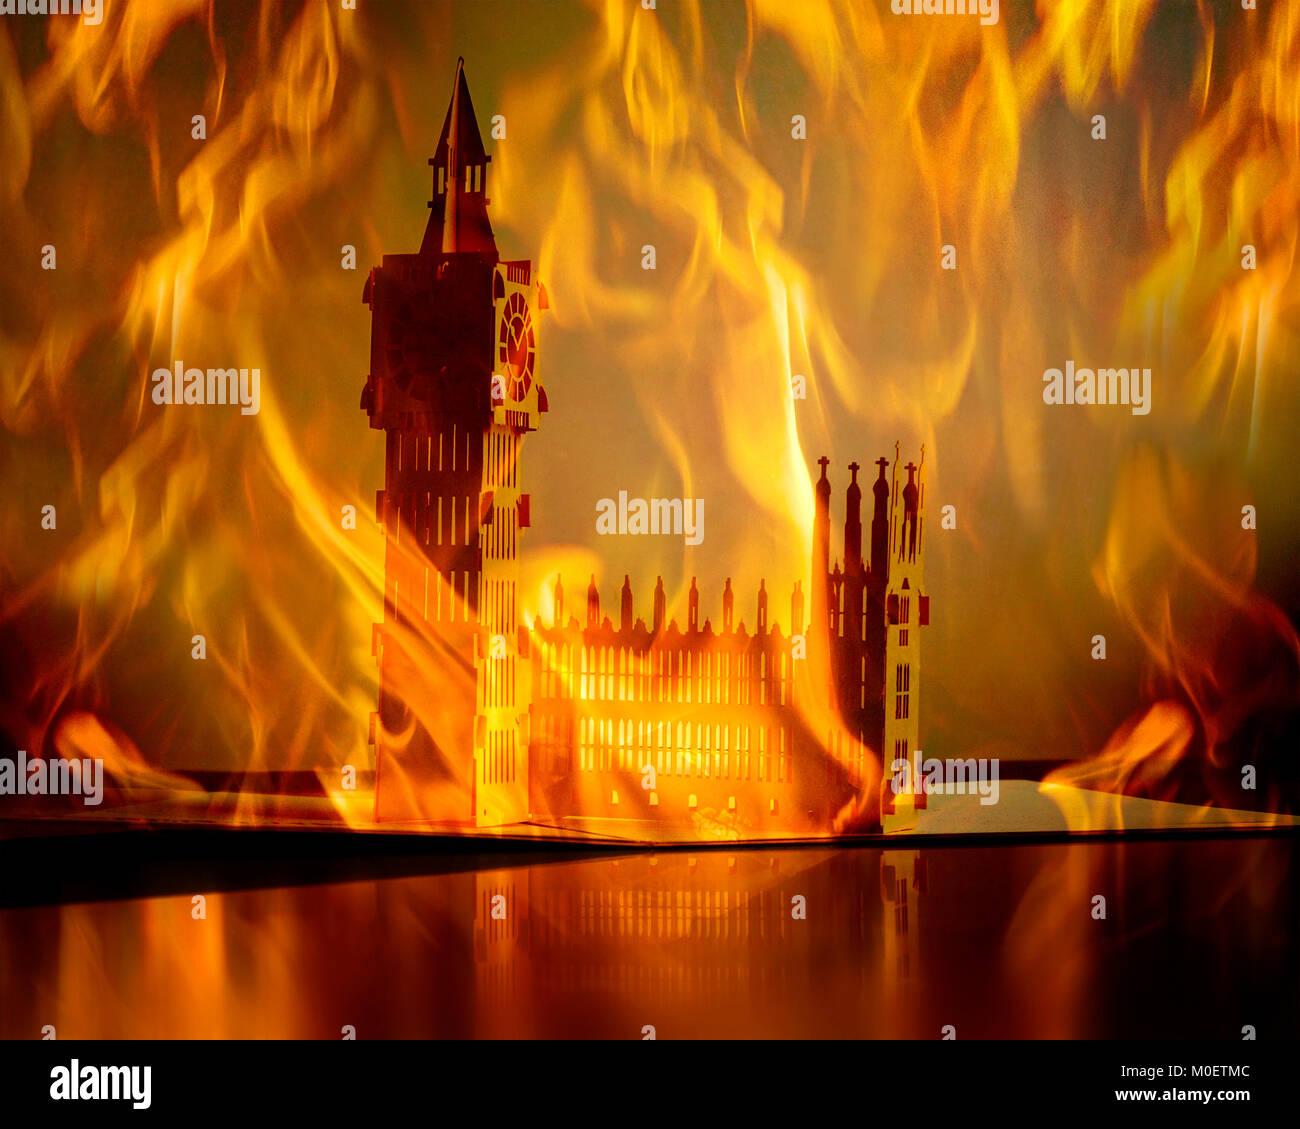 CONCEPT PHOTGRAPHY: London's Burning - Stock Image